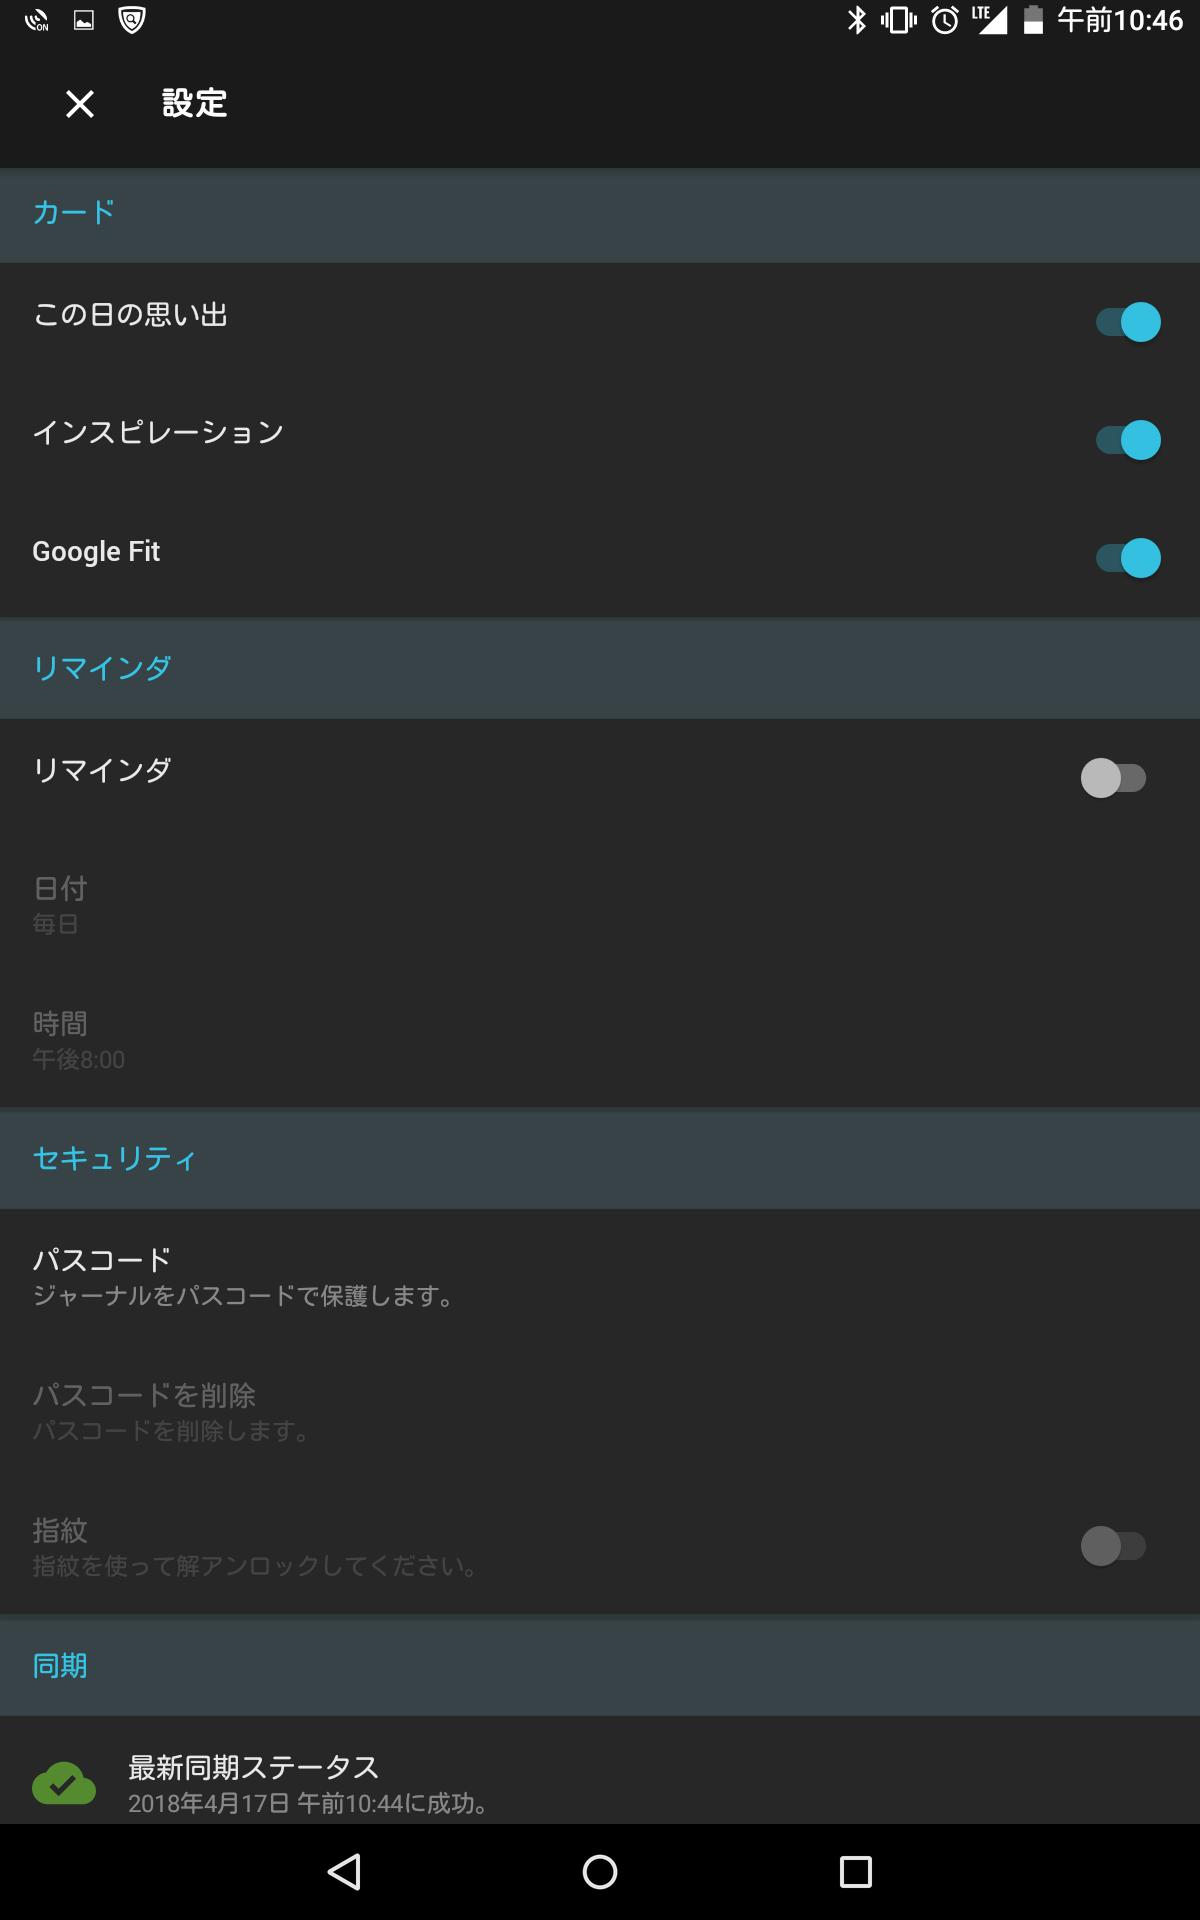 Screenshot_2018-04-17-10-46-36.png